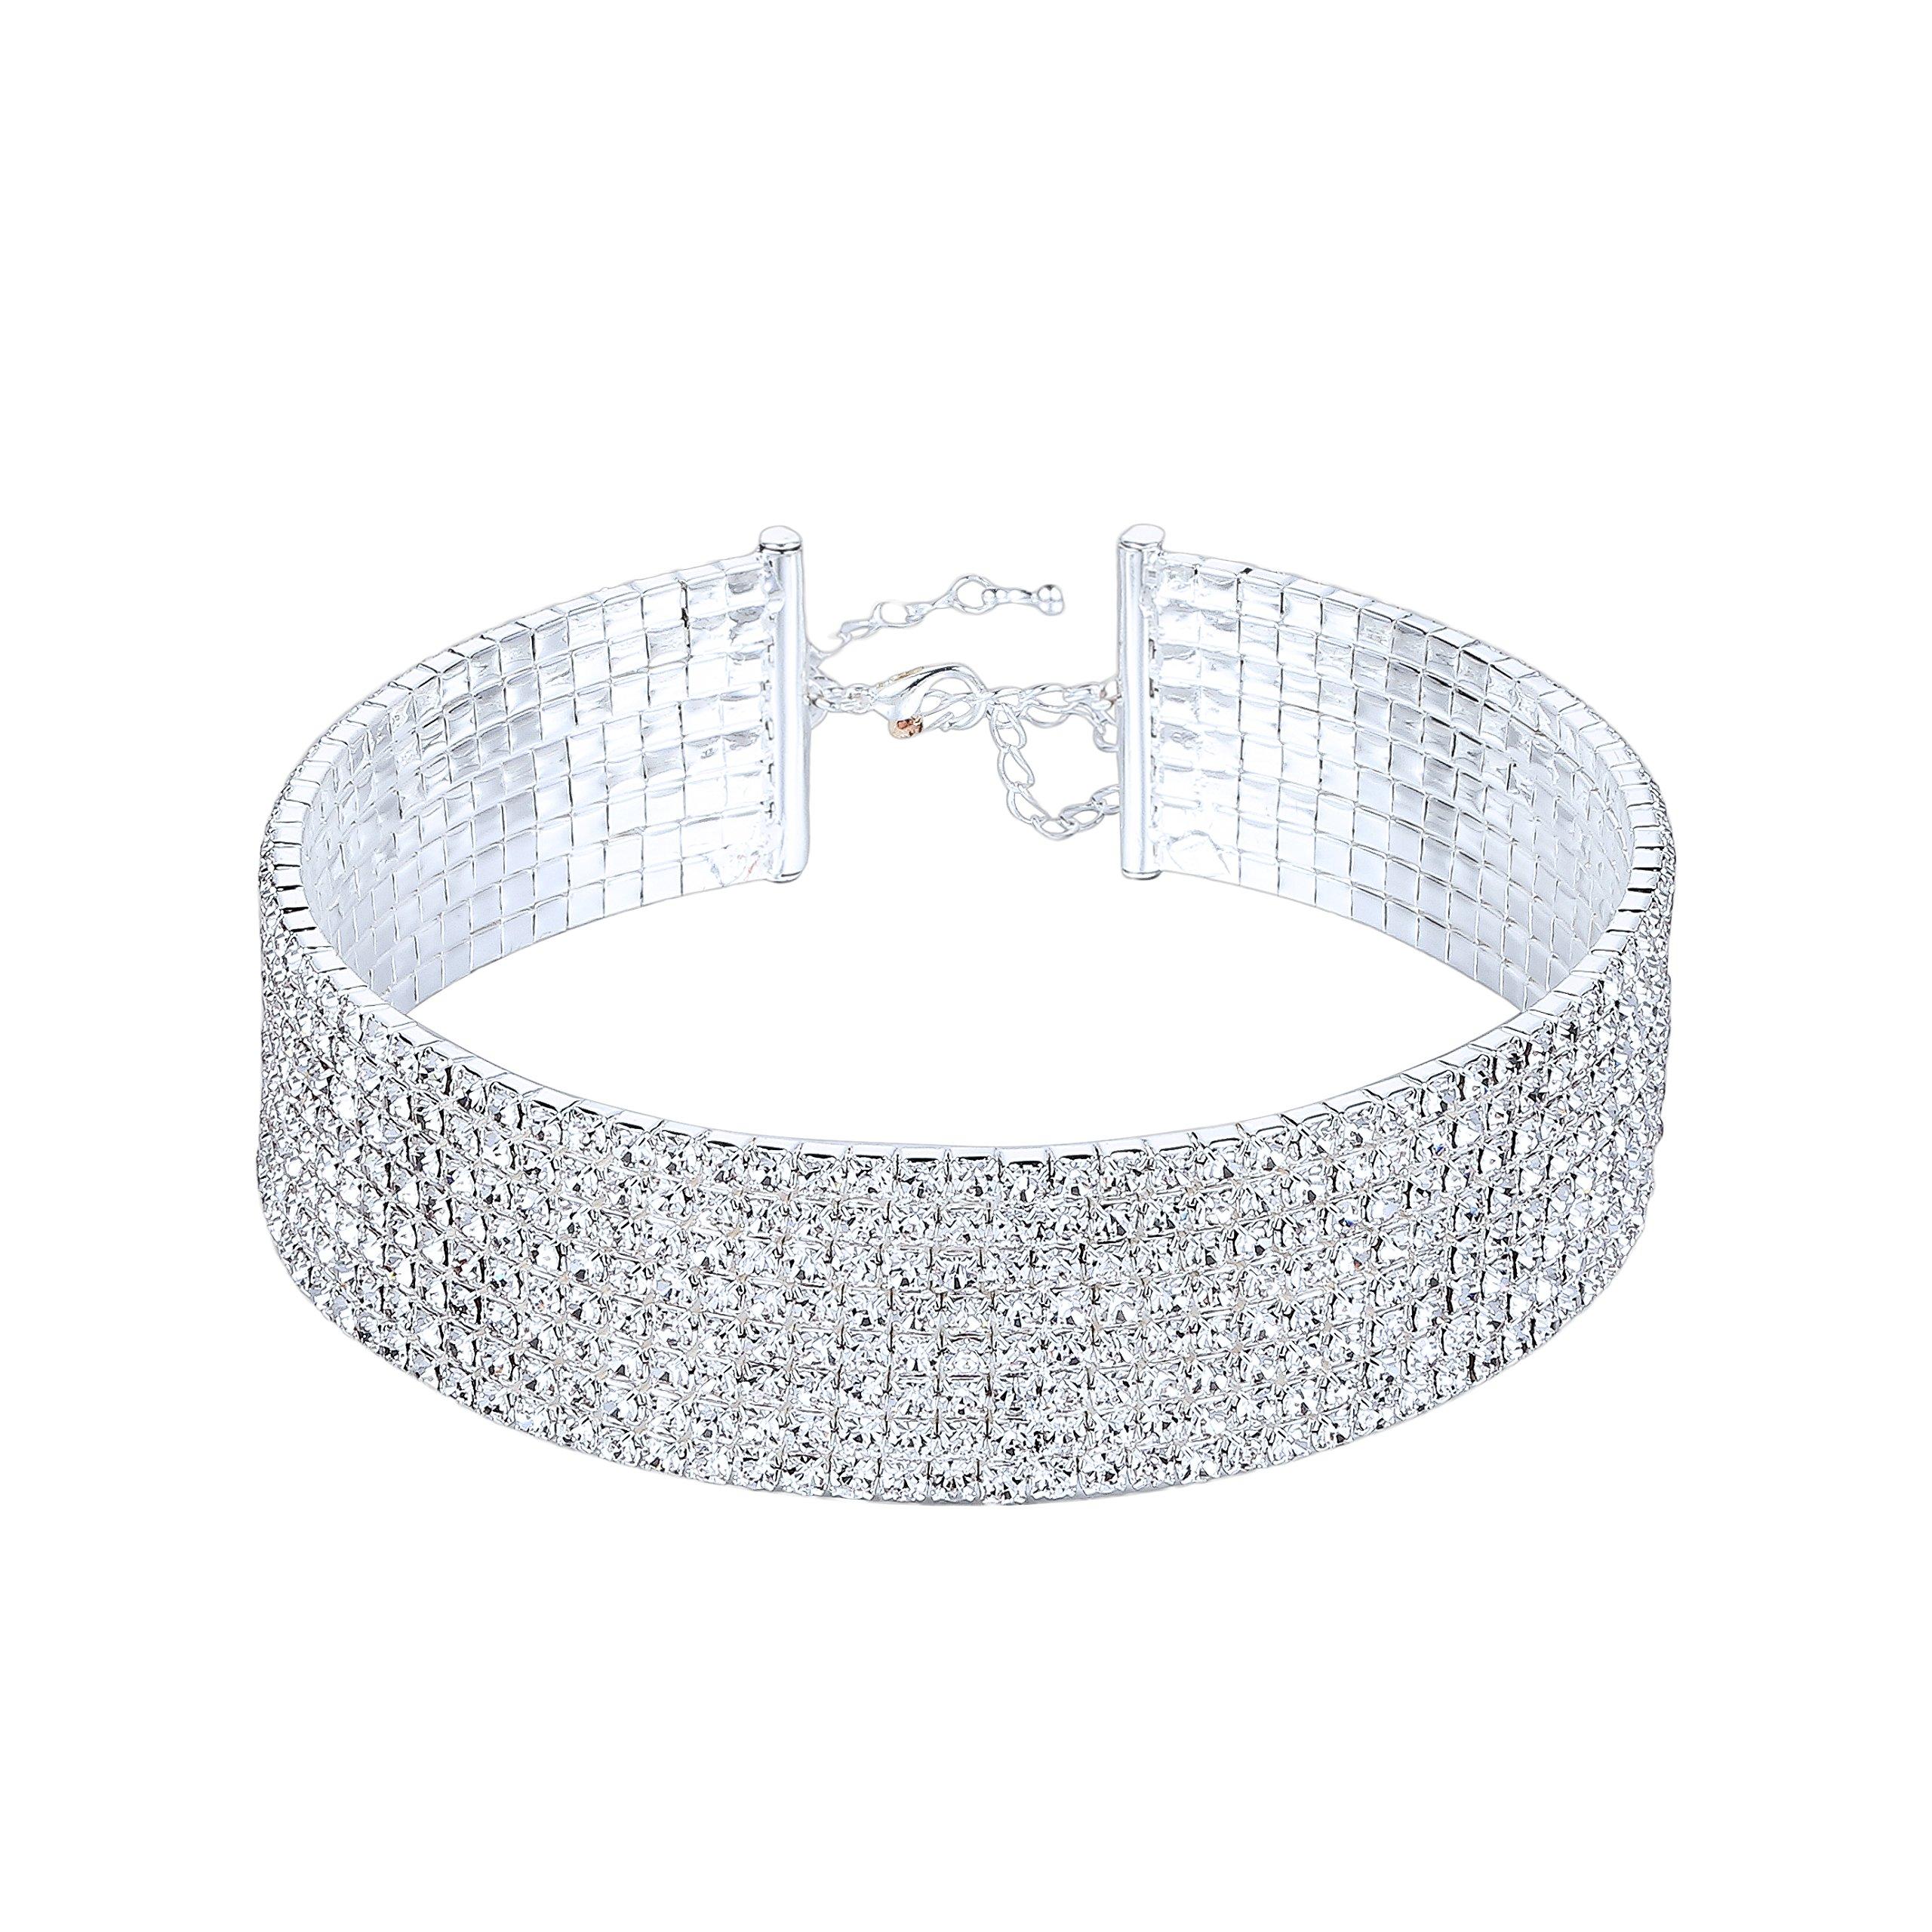 Clear Rhinestone Crystal Choker Necklace Wedding Collar Necklace Birthday Jewelry (8-Row)